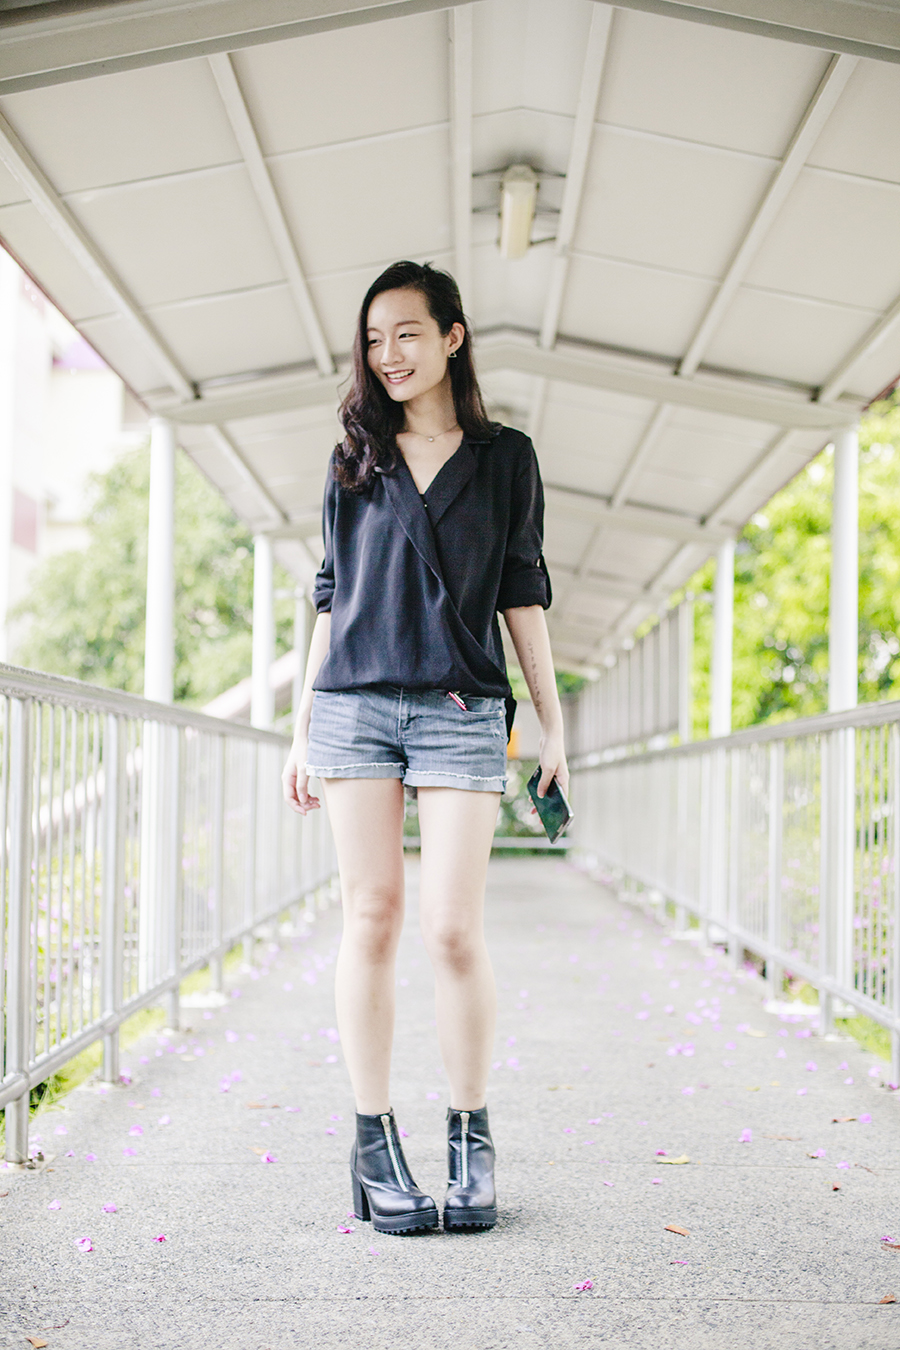 Basic ootd to The Script: Zalia black leaterette collar drape top, Forever 21 denim shorts, Rubi black platform boots.